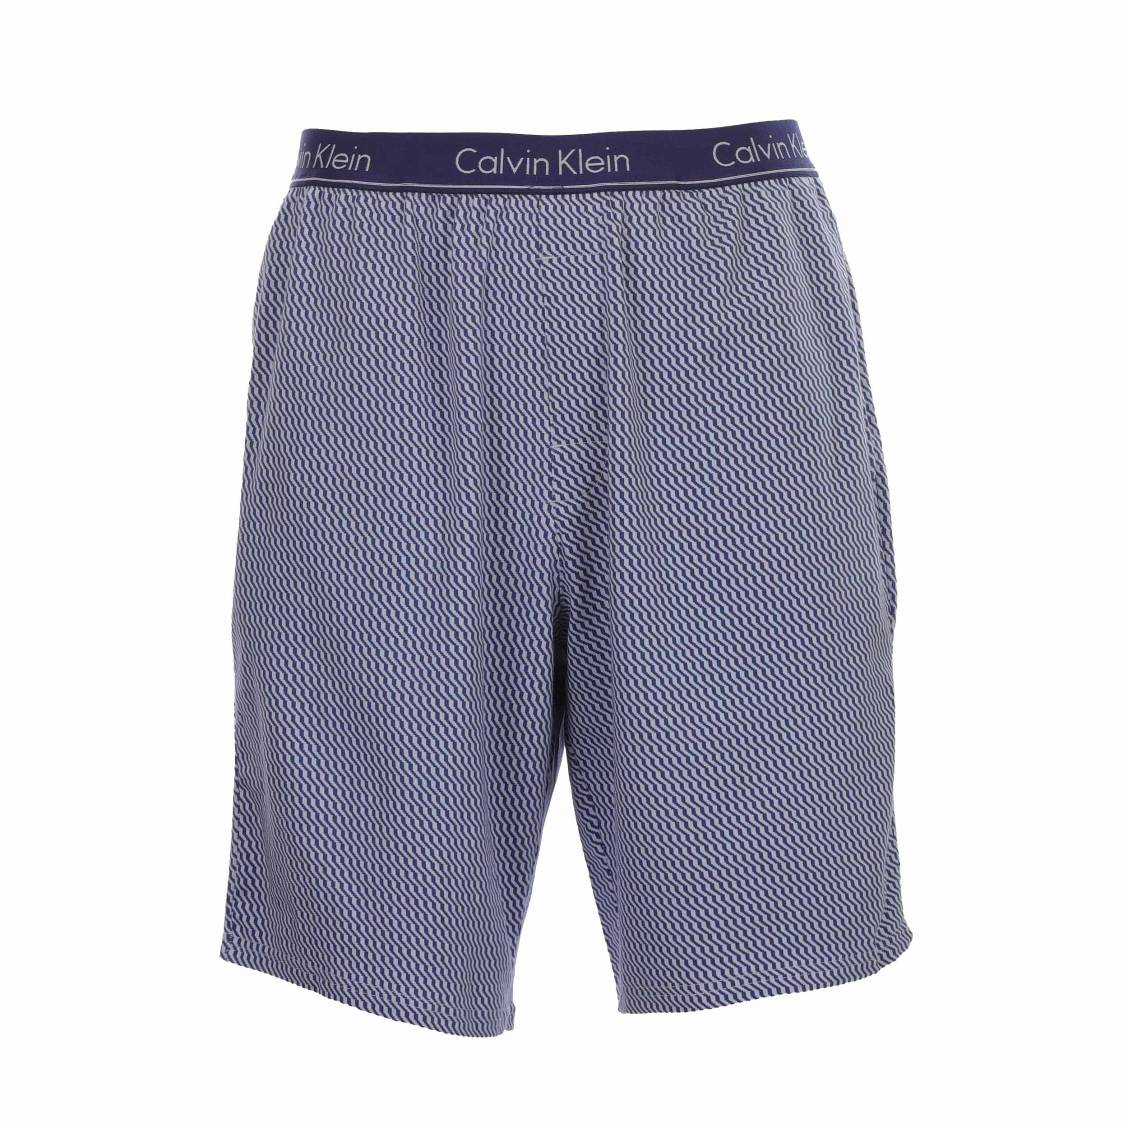 435945187e6 ... Pyjama court Calvin Klein en coton stretch   tee-shirt col rond bleu  pétrole et